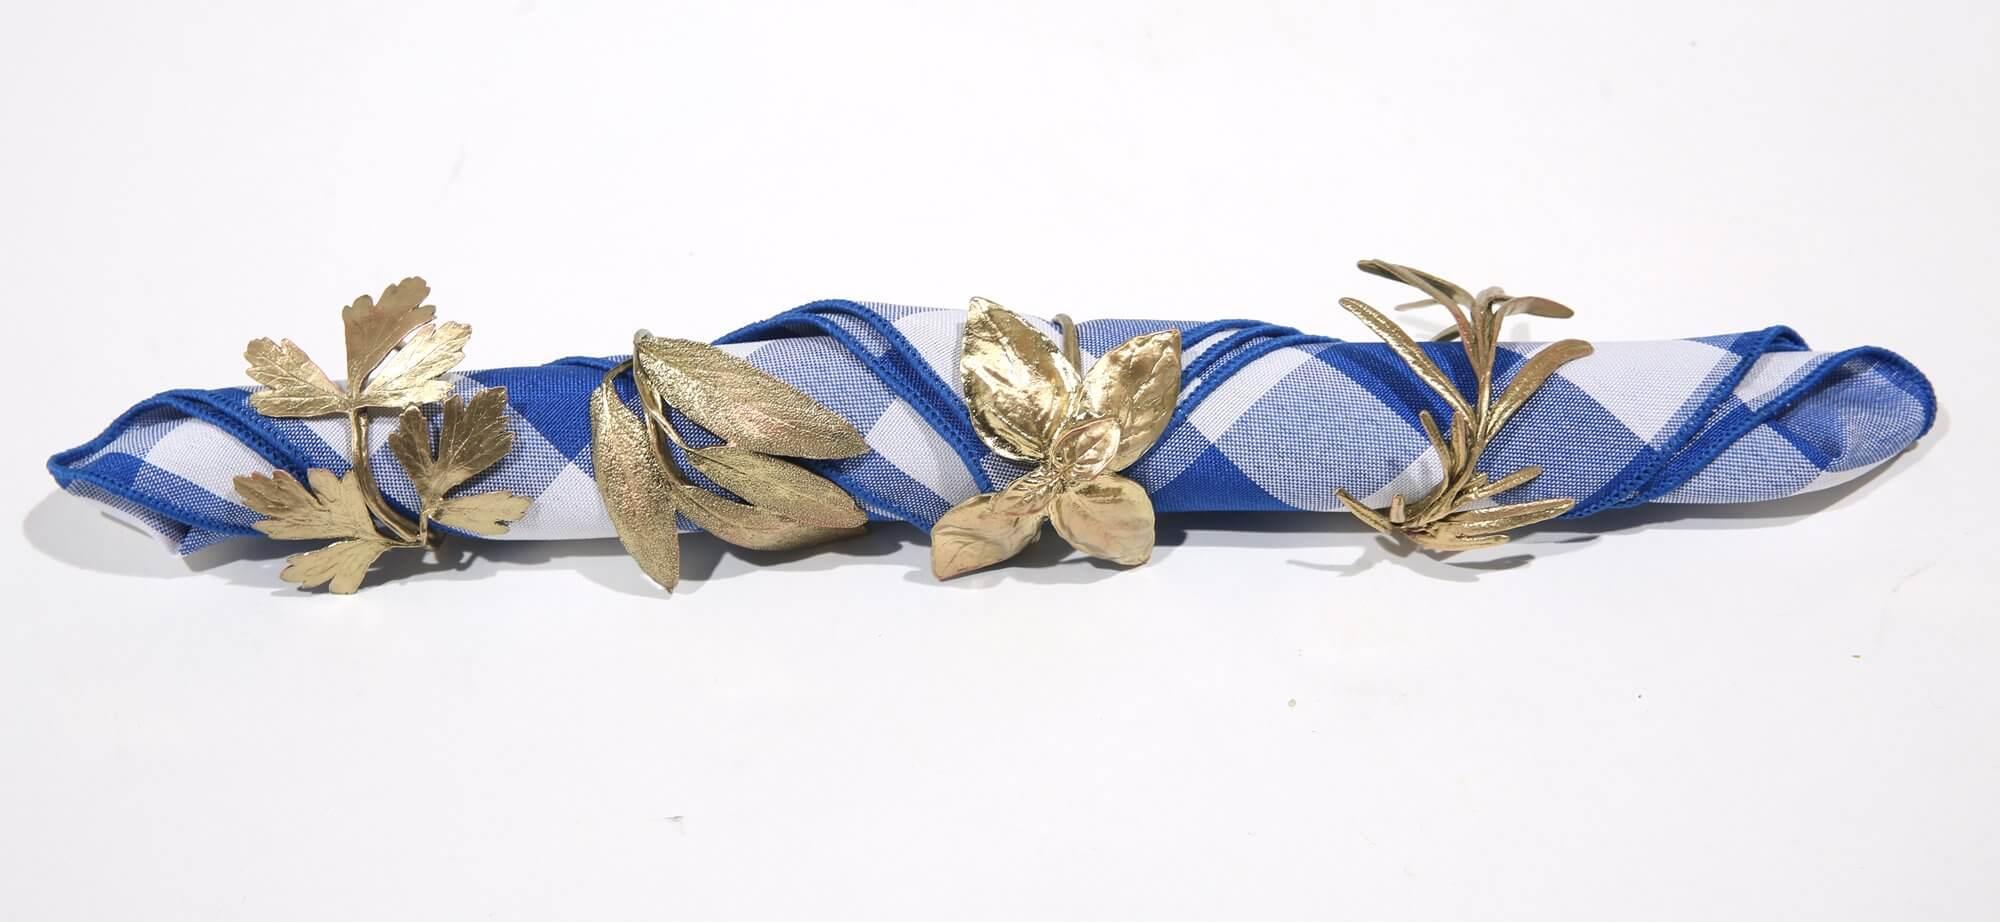 Italian herb napkin rings